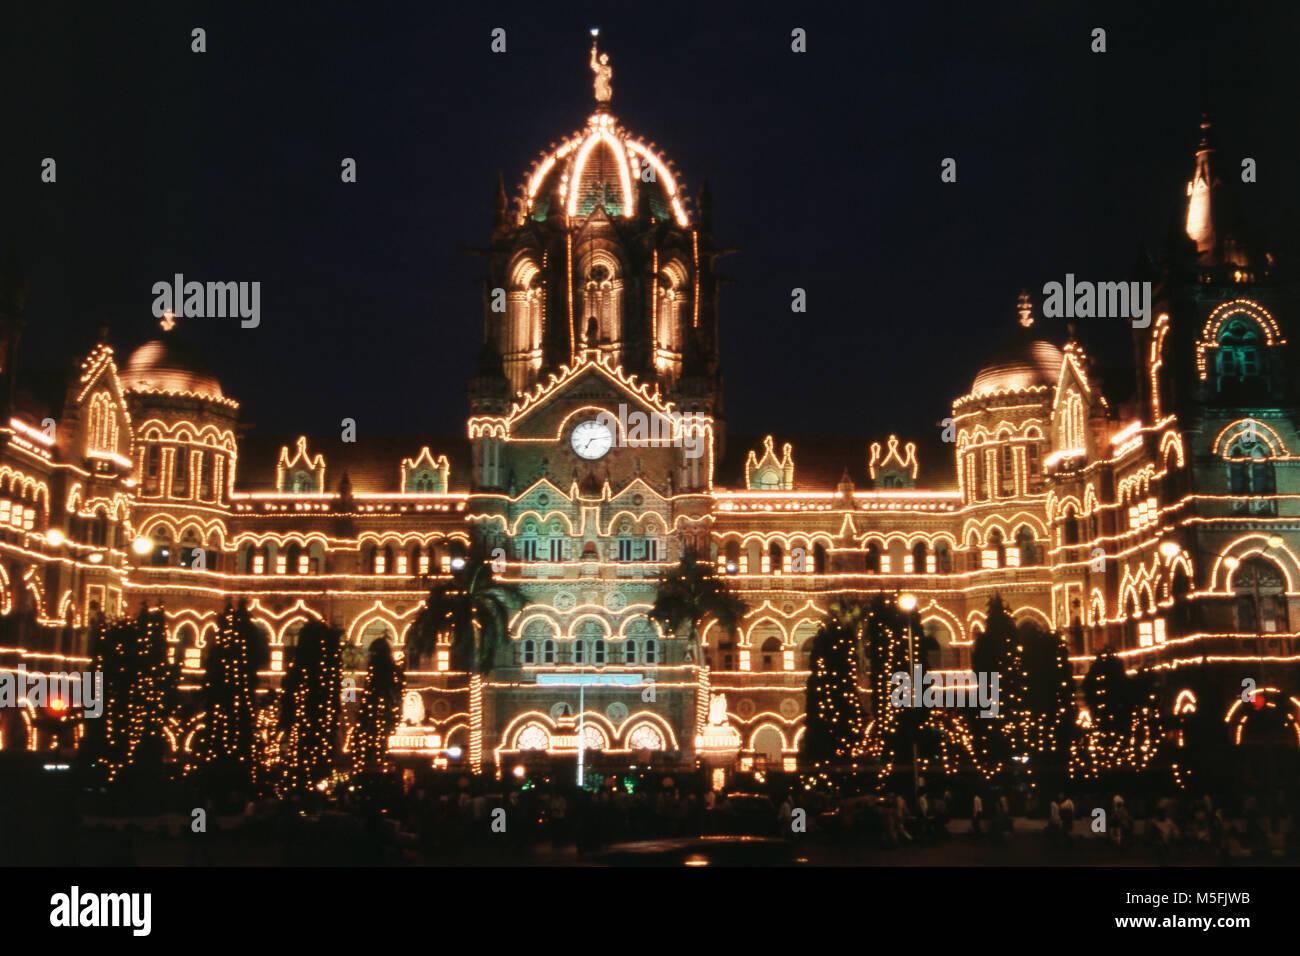 VT Station on 150 years of Completion, Mumbai, Maharashtra, India Stock Photo